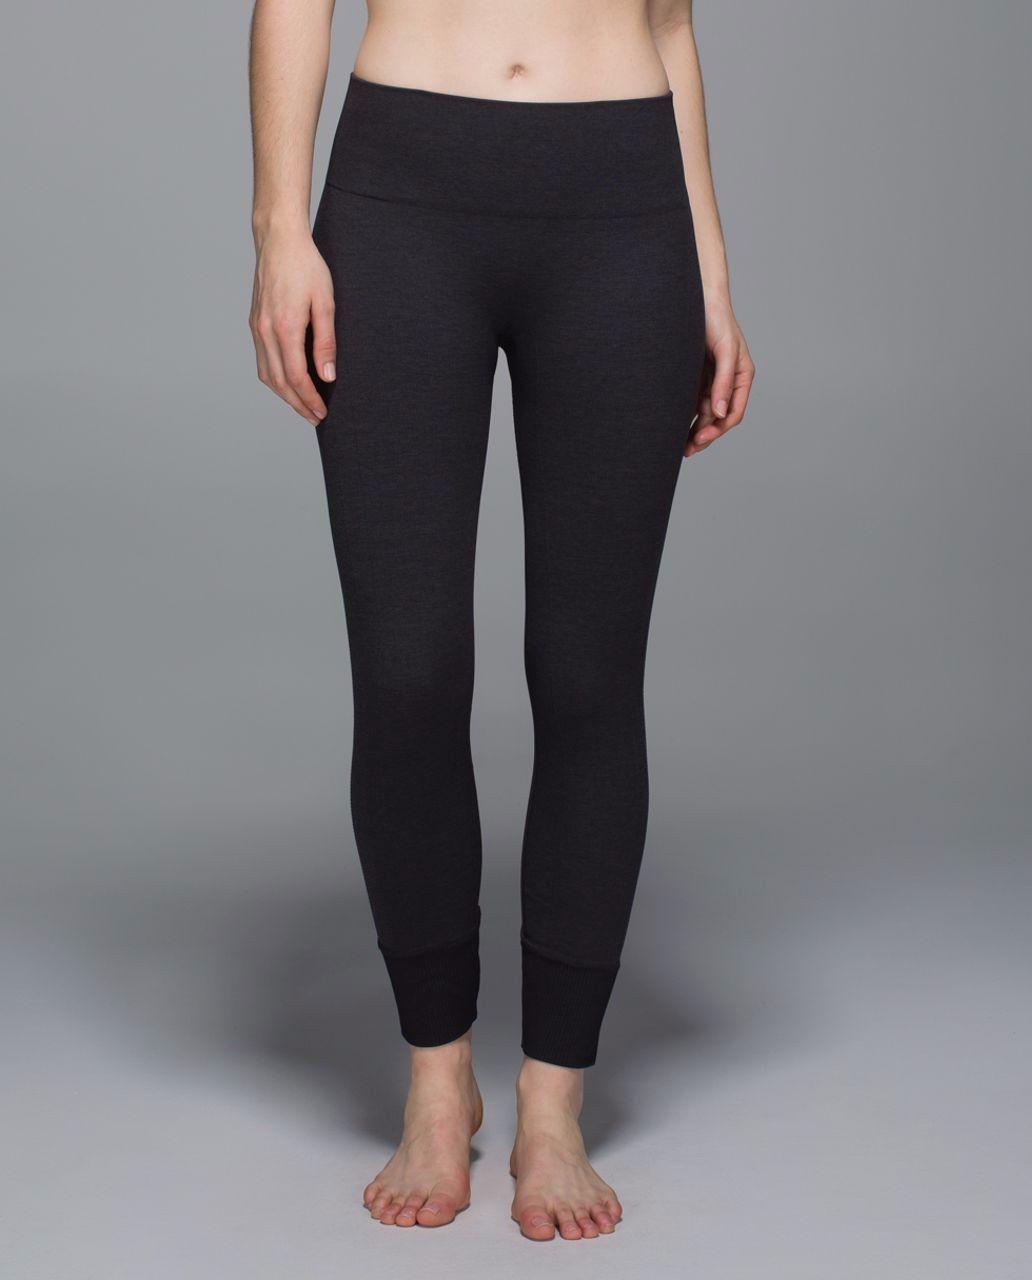 c4b33c8512c65a Lululemon Ebb to Street Pant 6 Heathered Black Seamless Hi-Rise Stretch  legging